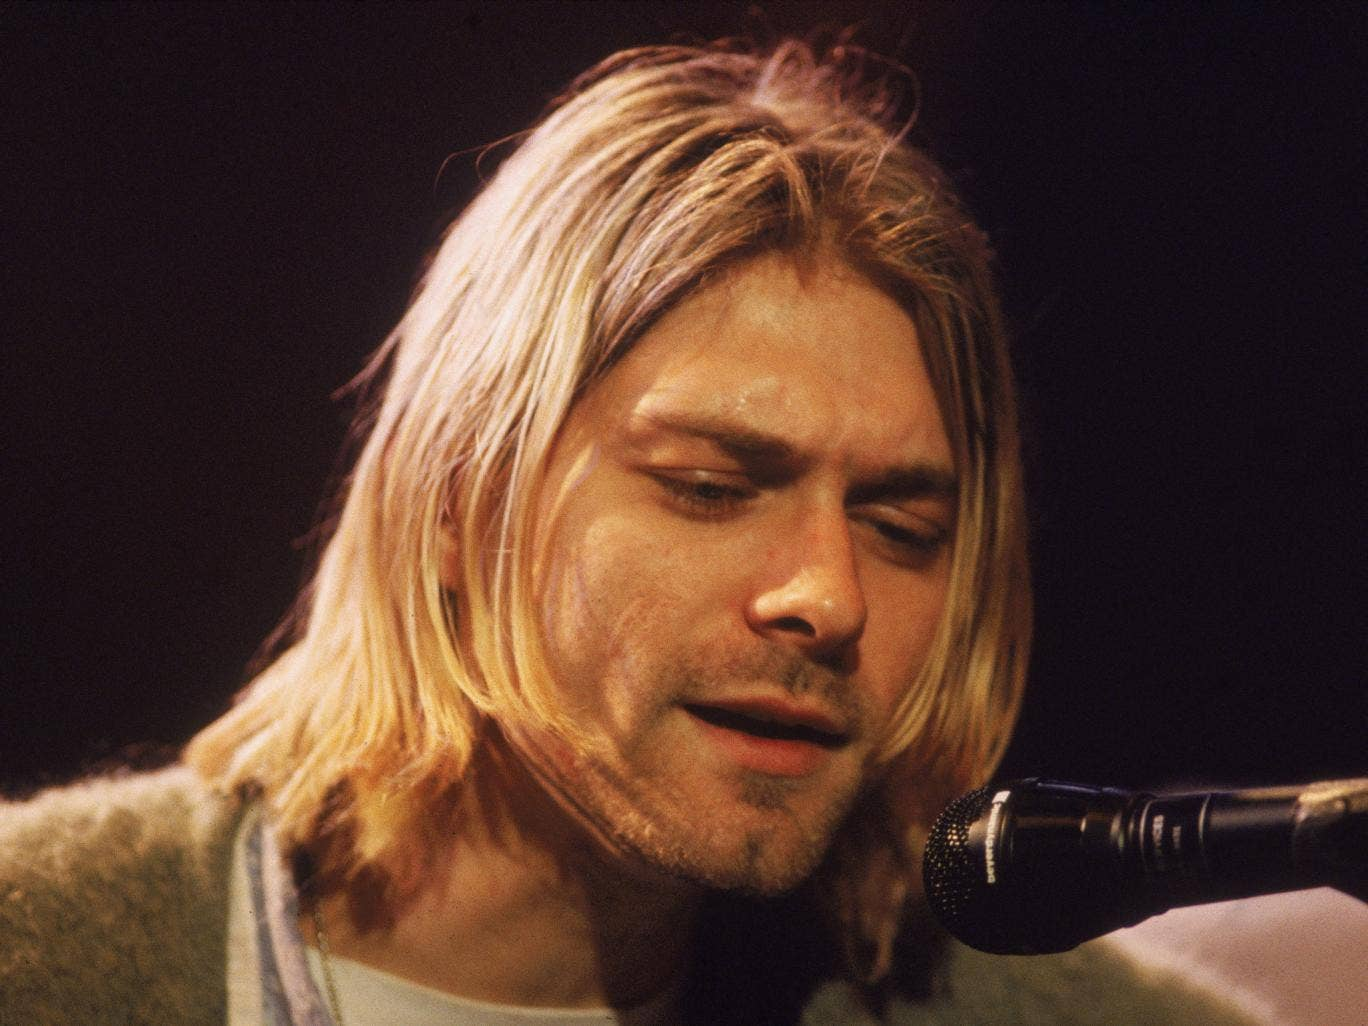 Strum as you are: Kurt Cobain